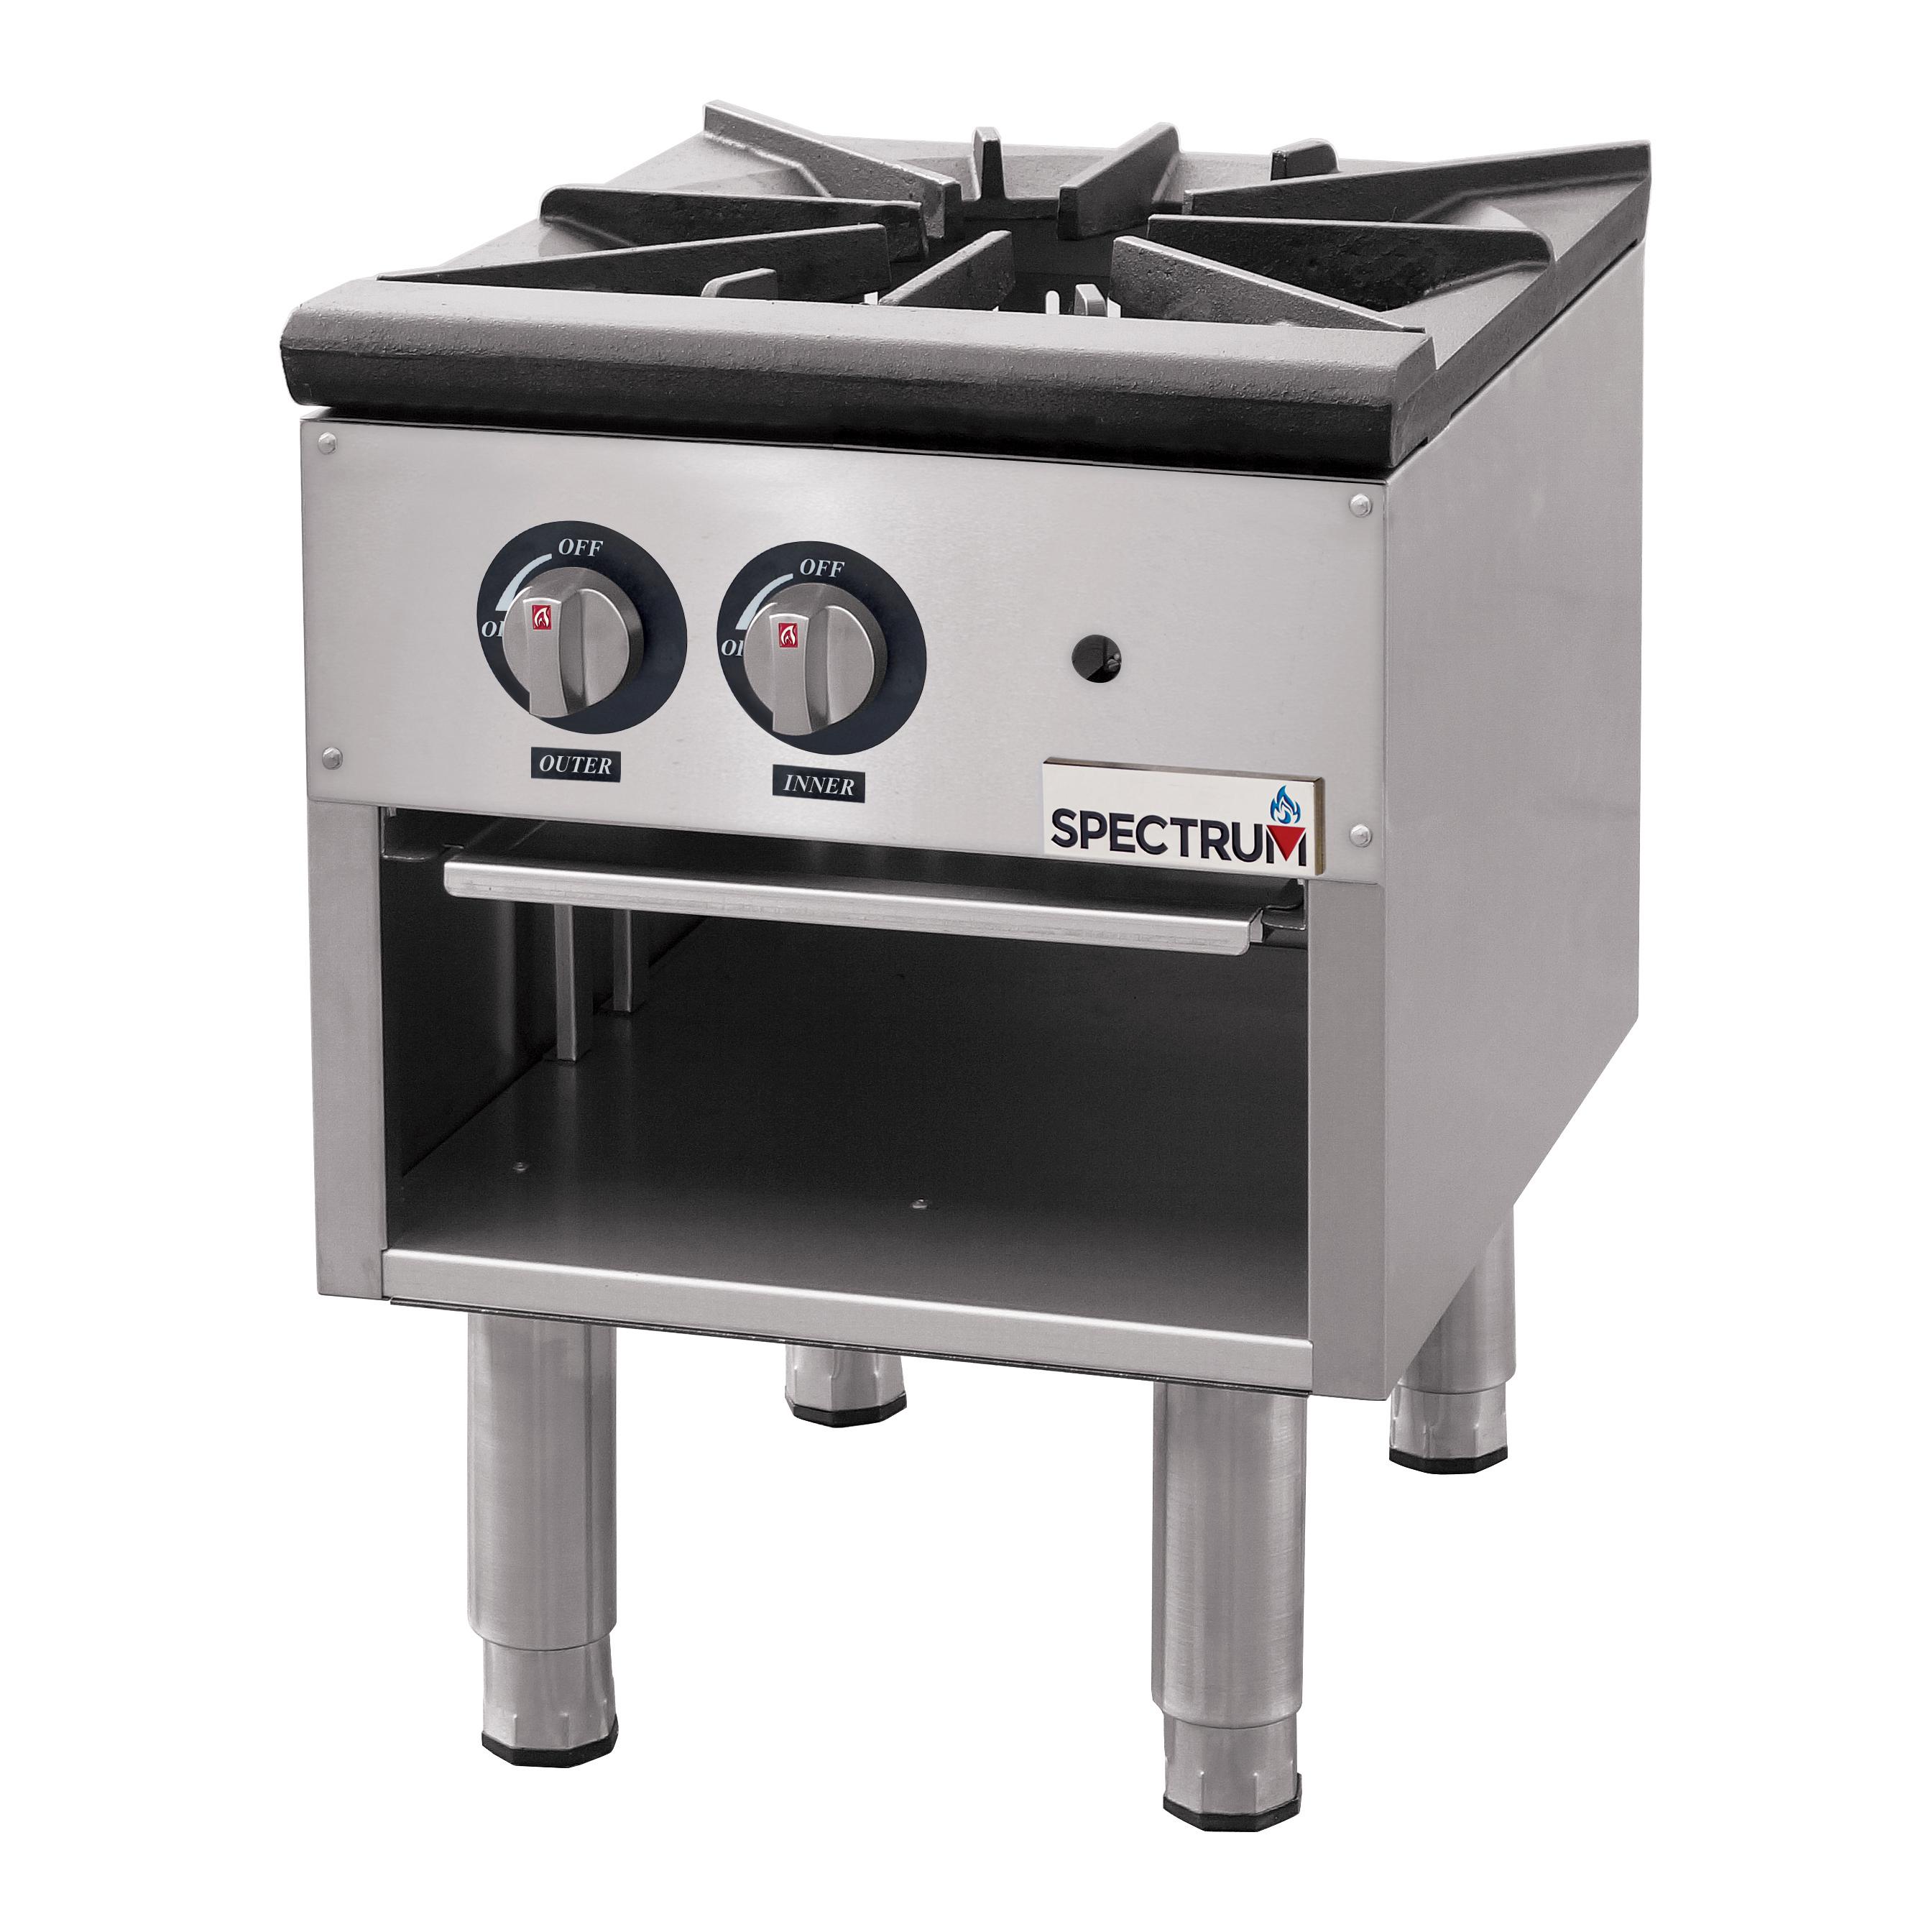 Winco NGSP-1 range, stock pot, gas